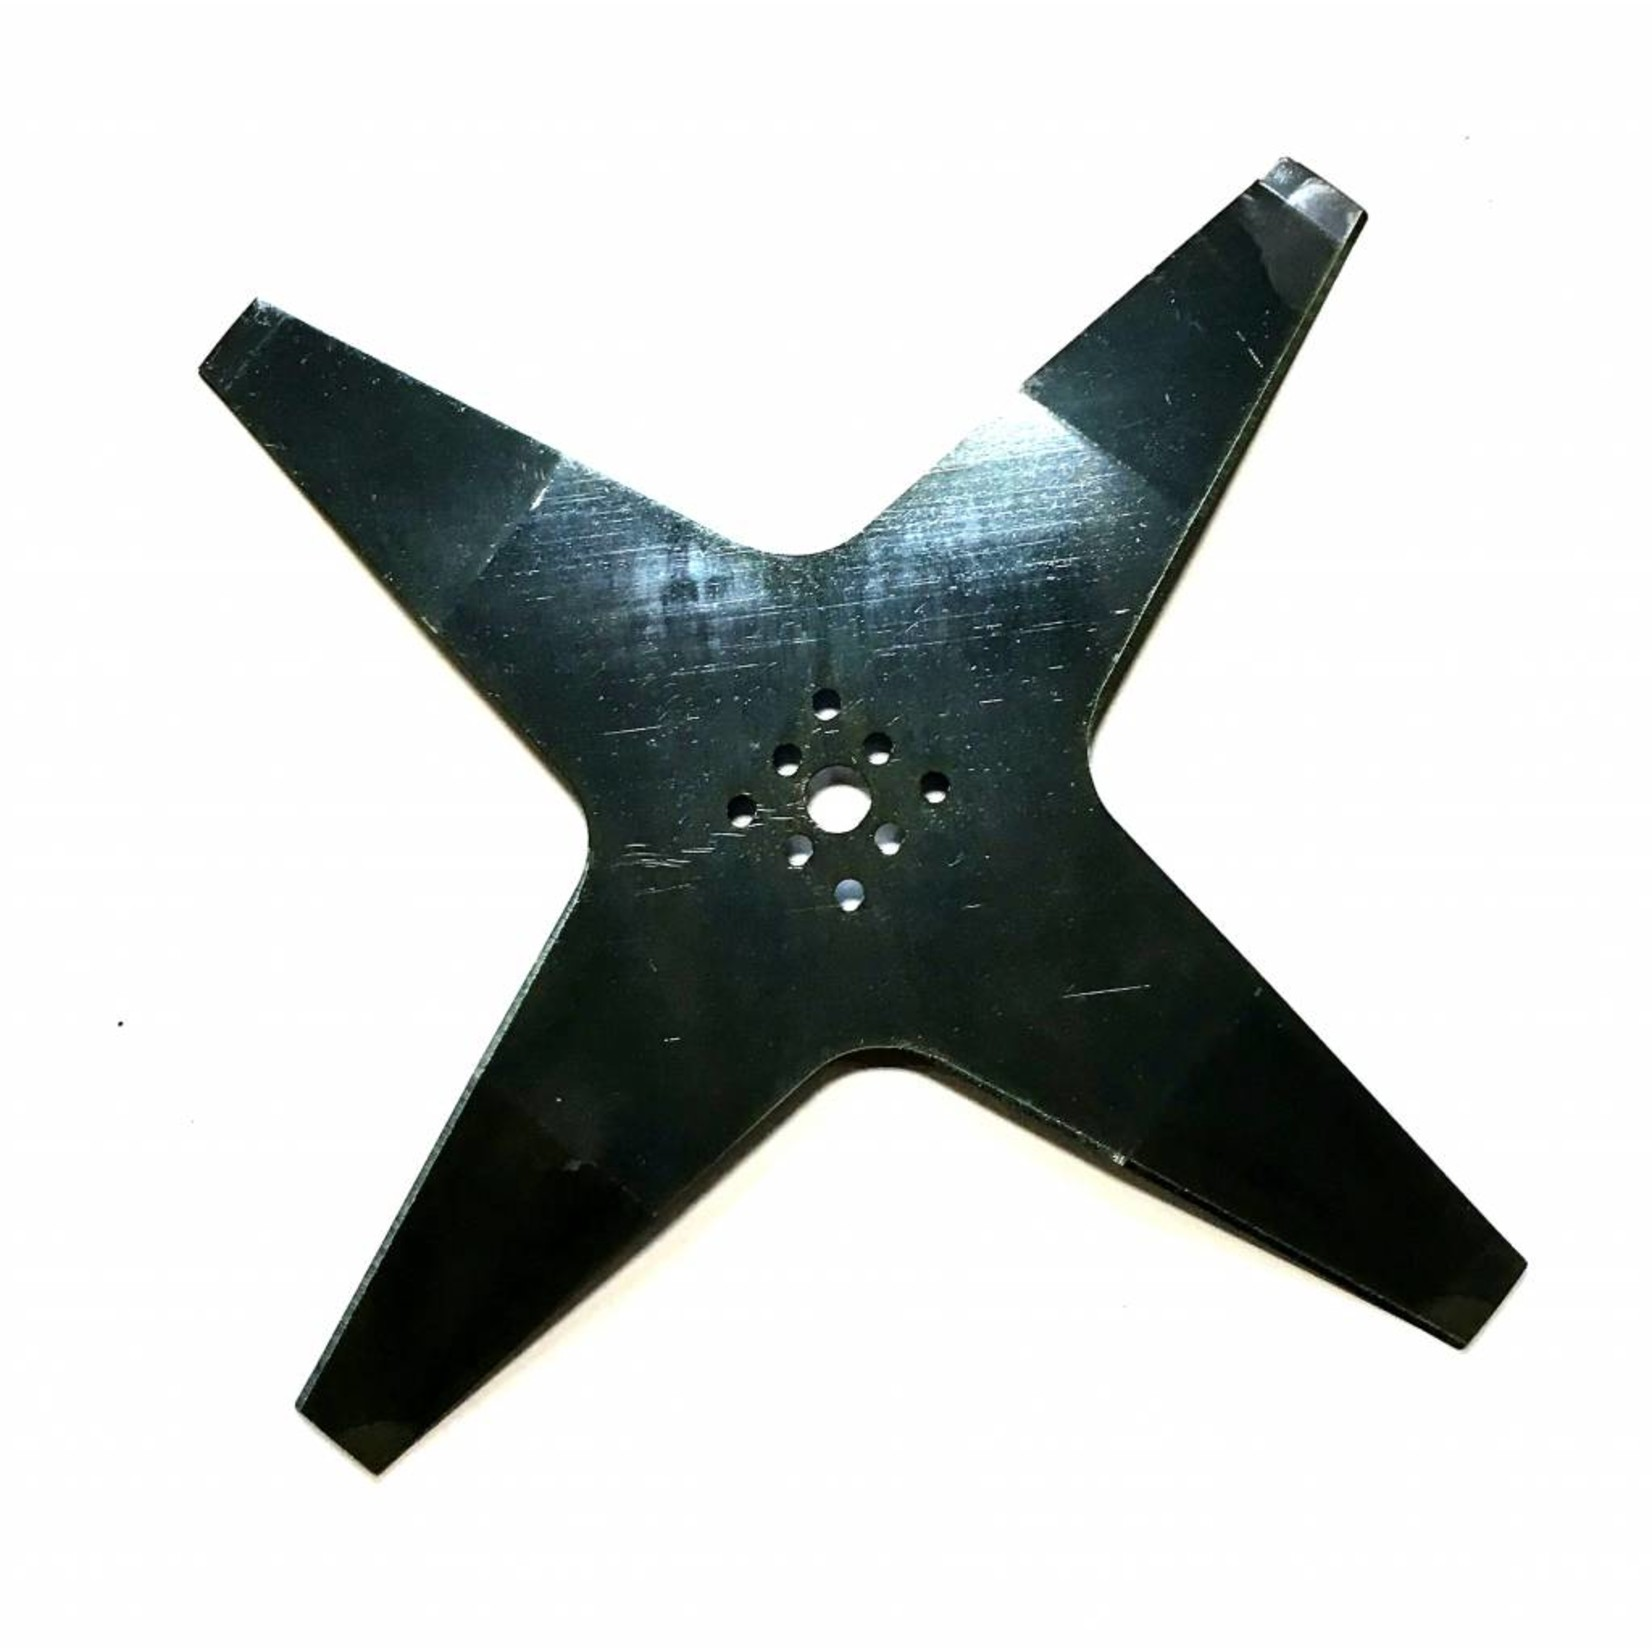 Ambrogio Ambrogio 50_D0018_02 4-Stern-Federmesser Original 25 cm gekröpft Messer